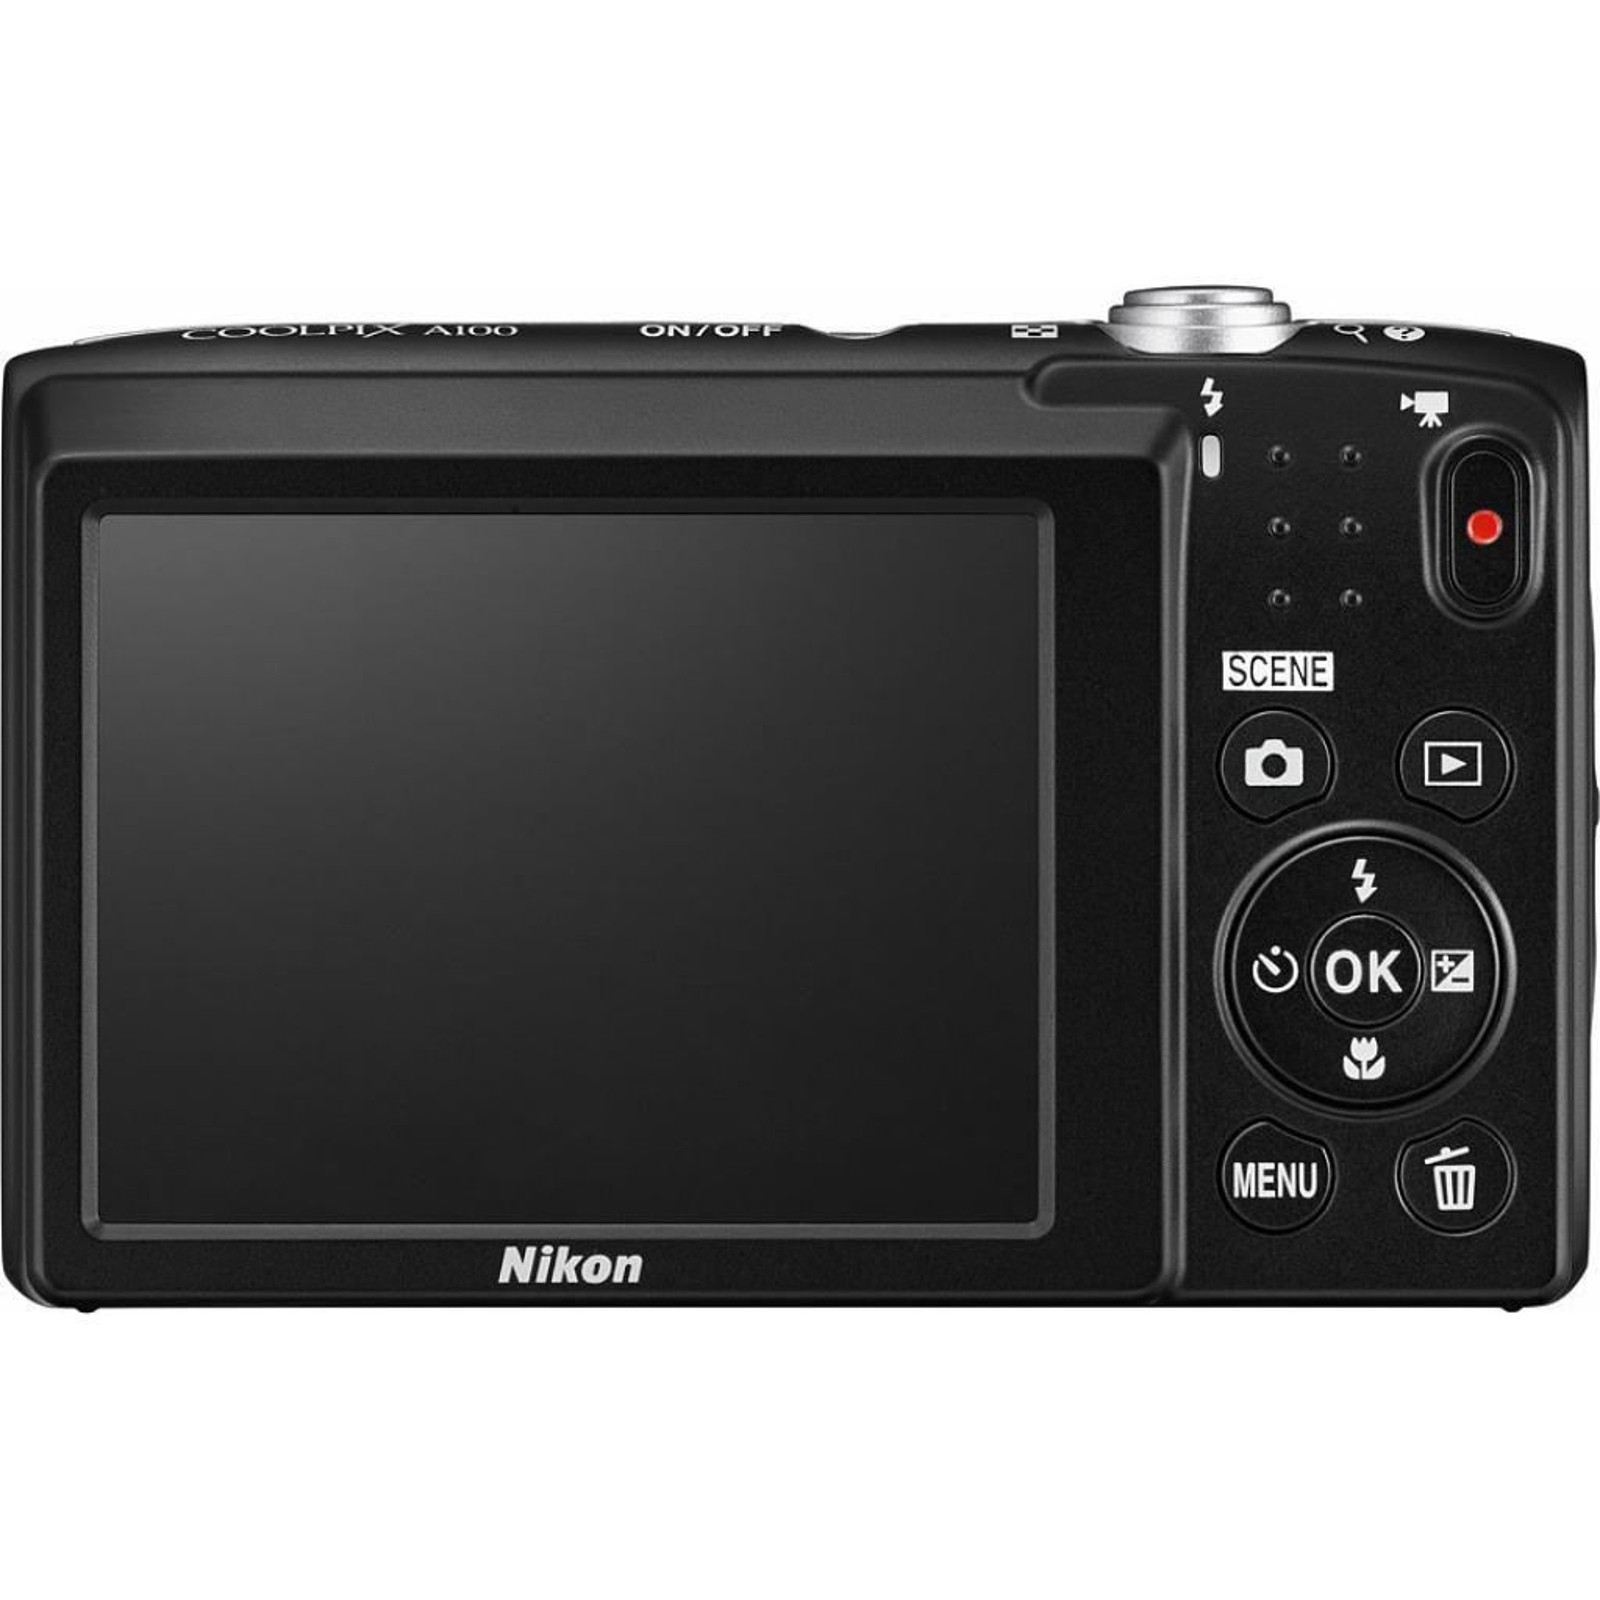 Цифровой фотоаппарат Nikon Coolpix A100 Black (VNA971E1) изображение 3